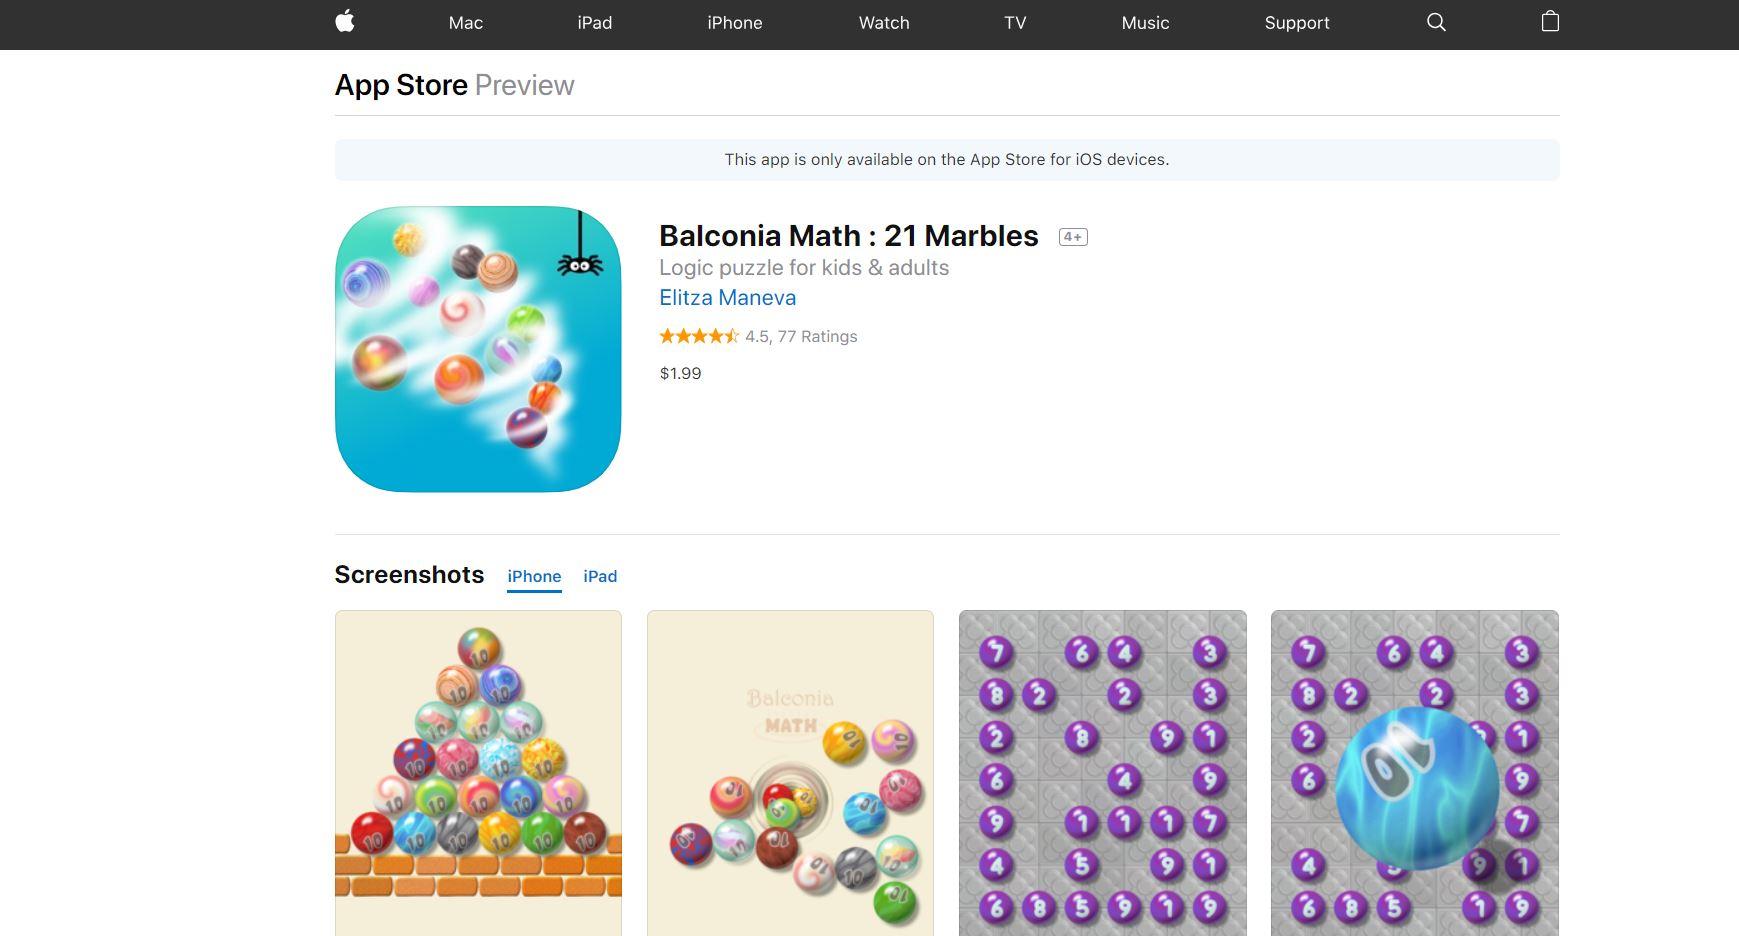 Balconia Math CodaKid Top 21 Math Apps of 2019